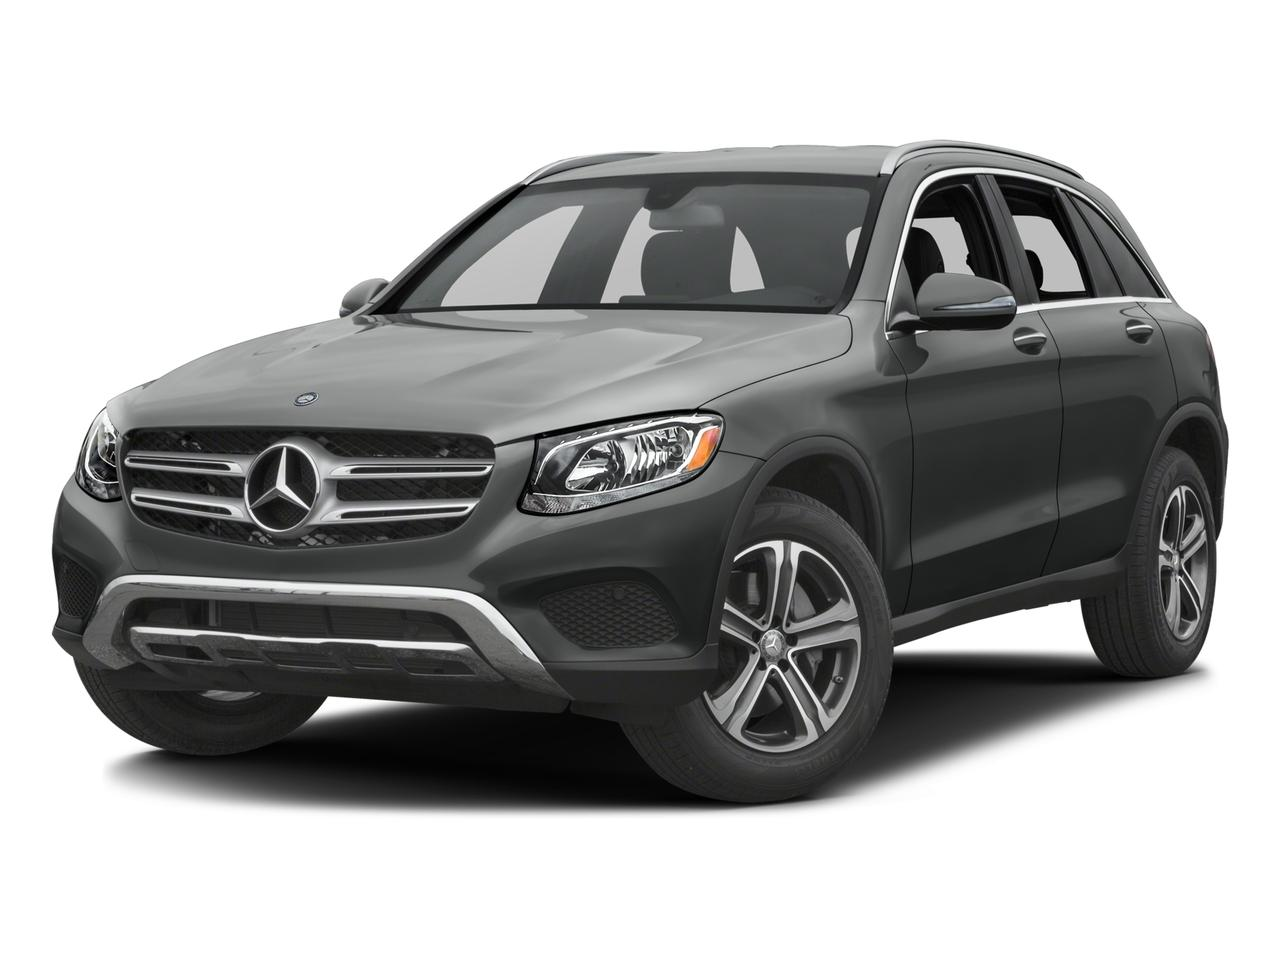 2016 Mercedes-Benz GLC Vehicle Photo in San Antonio, TX 78230